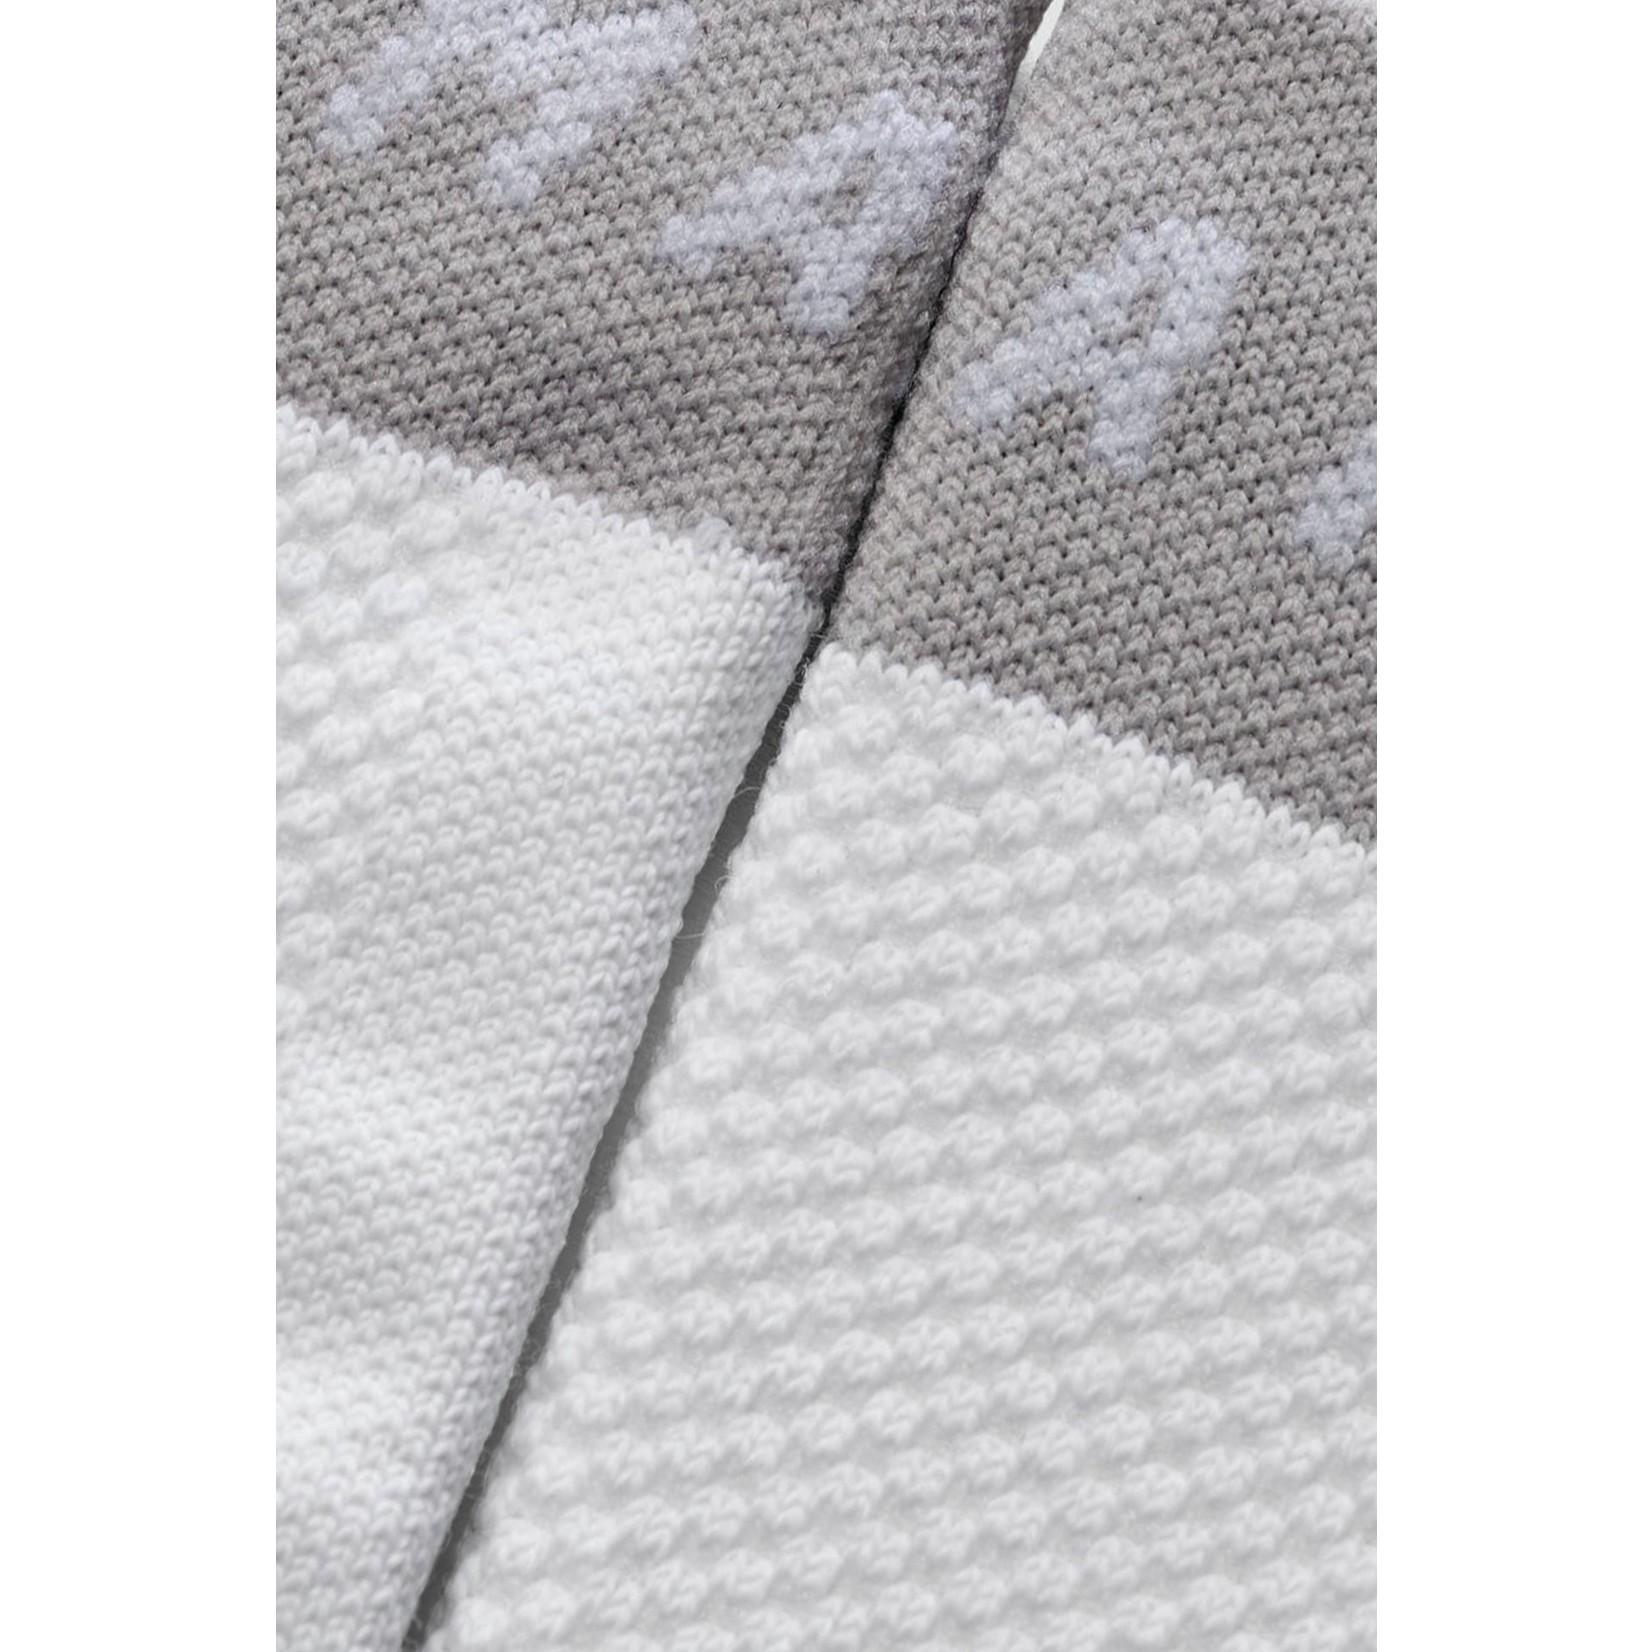 Maap MAAP Pro Air Socks - White/Grey